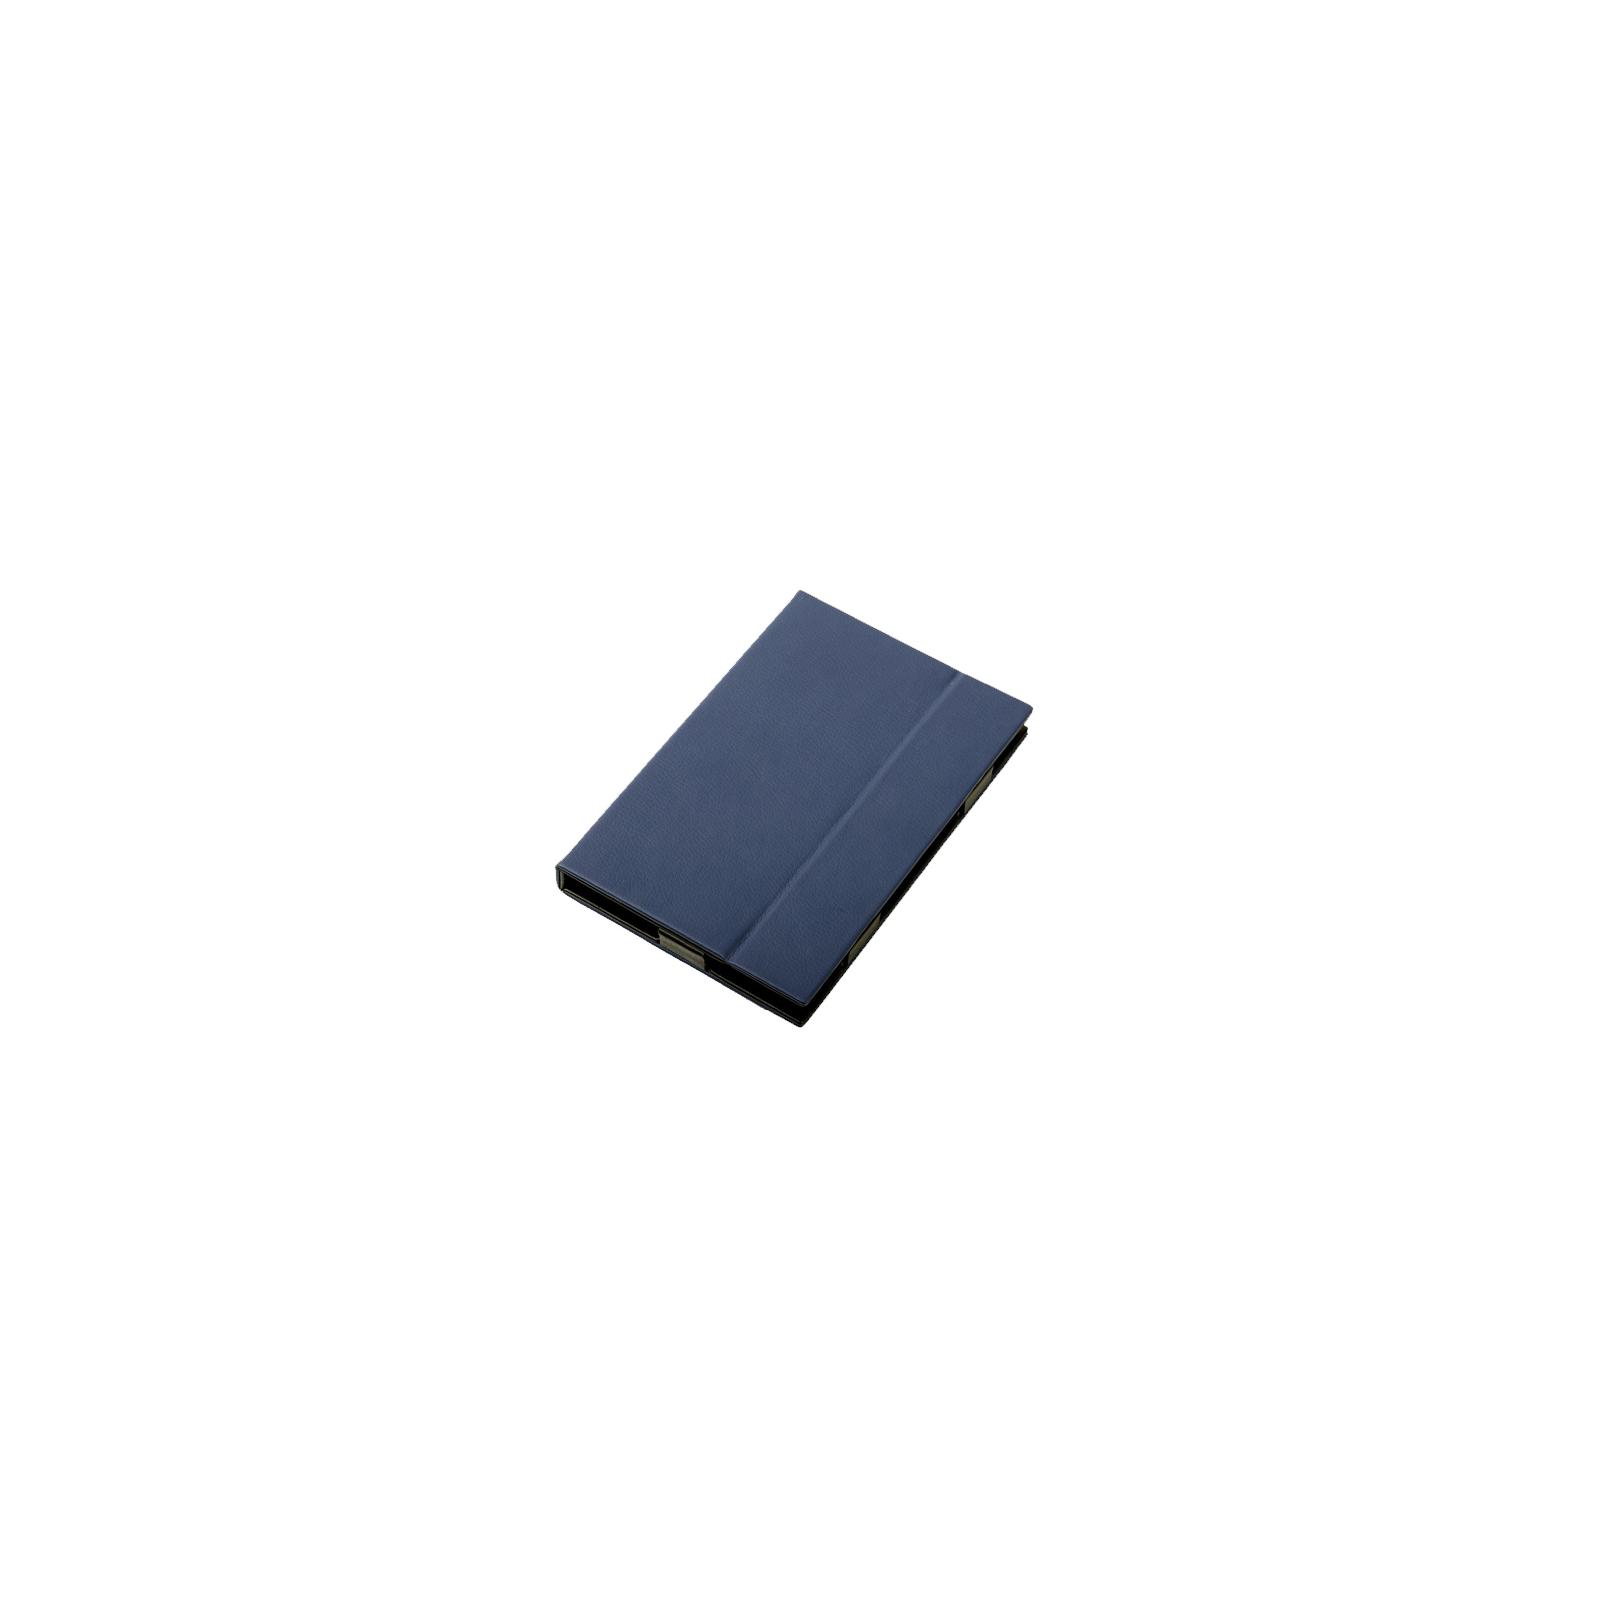 Чехол для планшета Vento 8 Desire Matt - dark blue